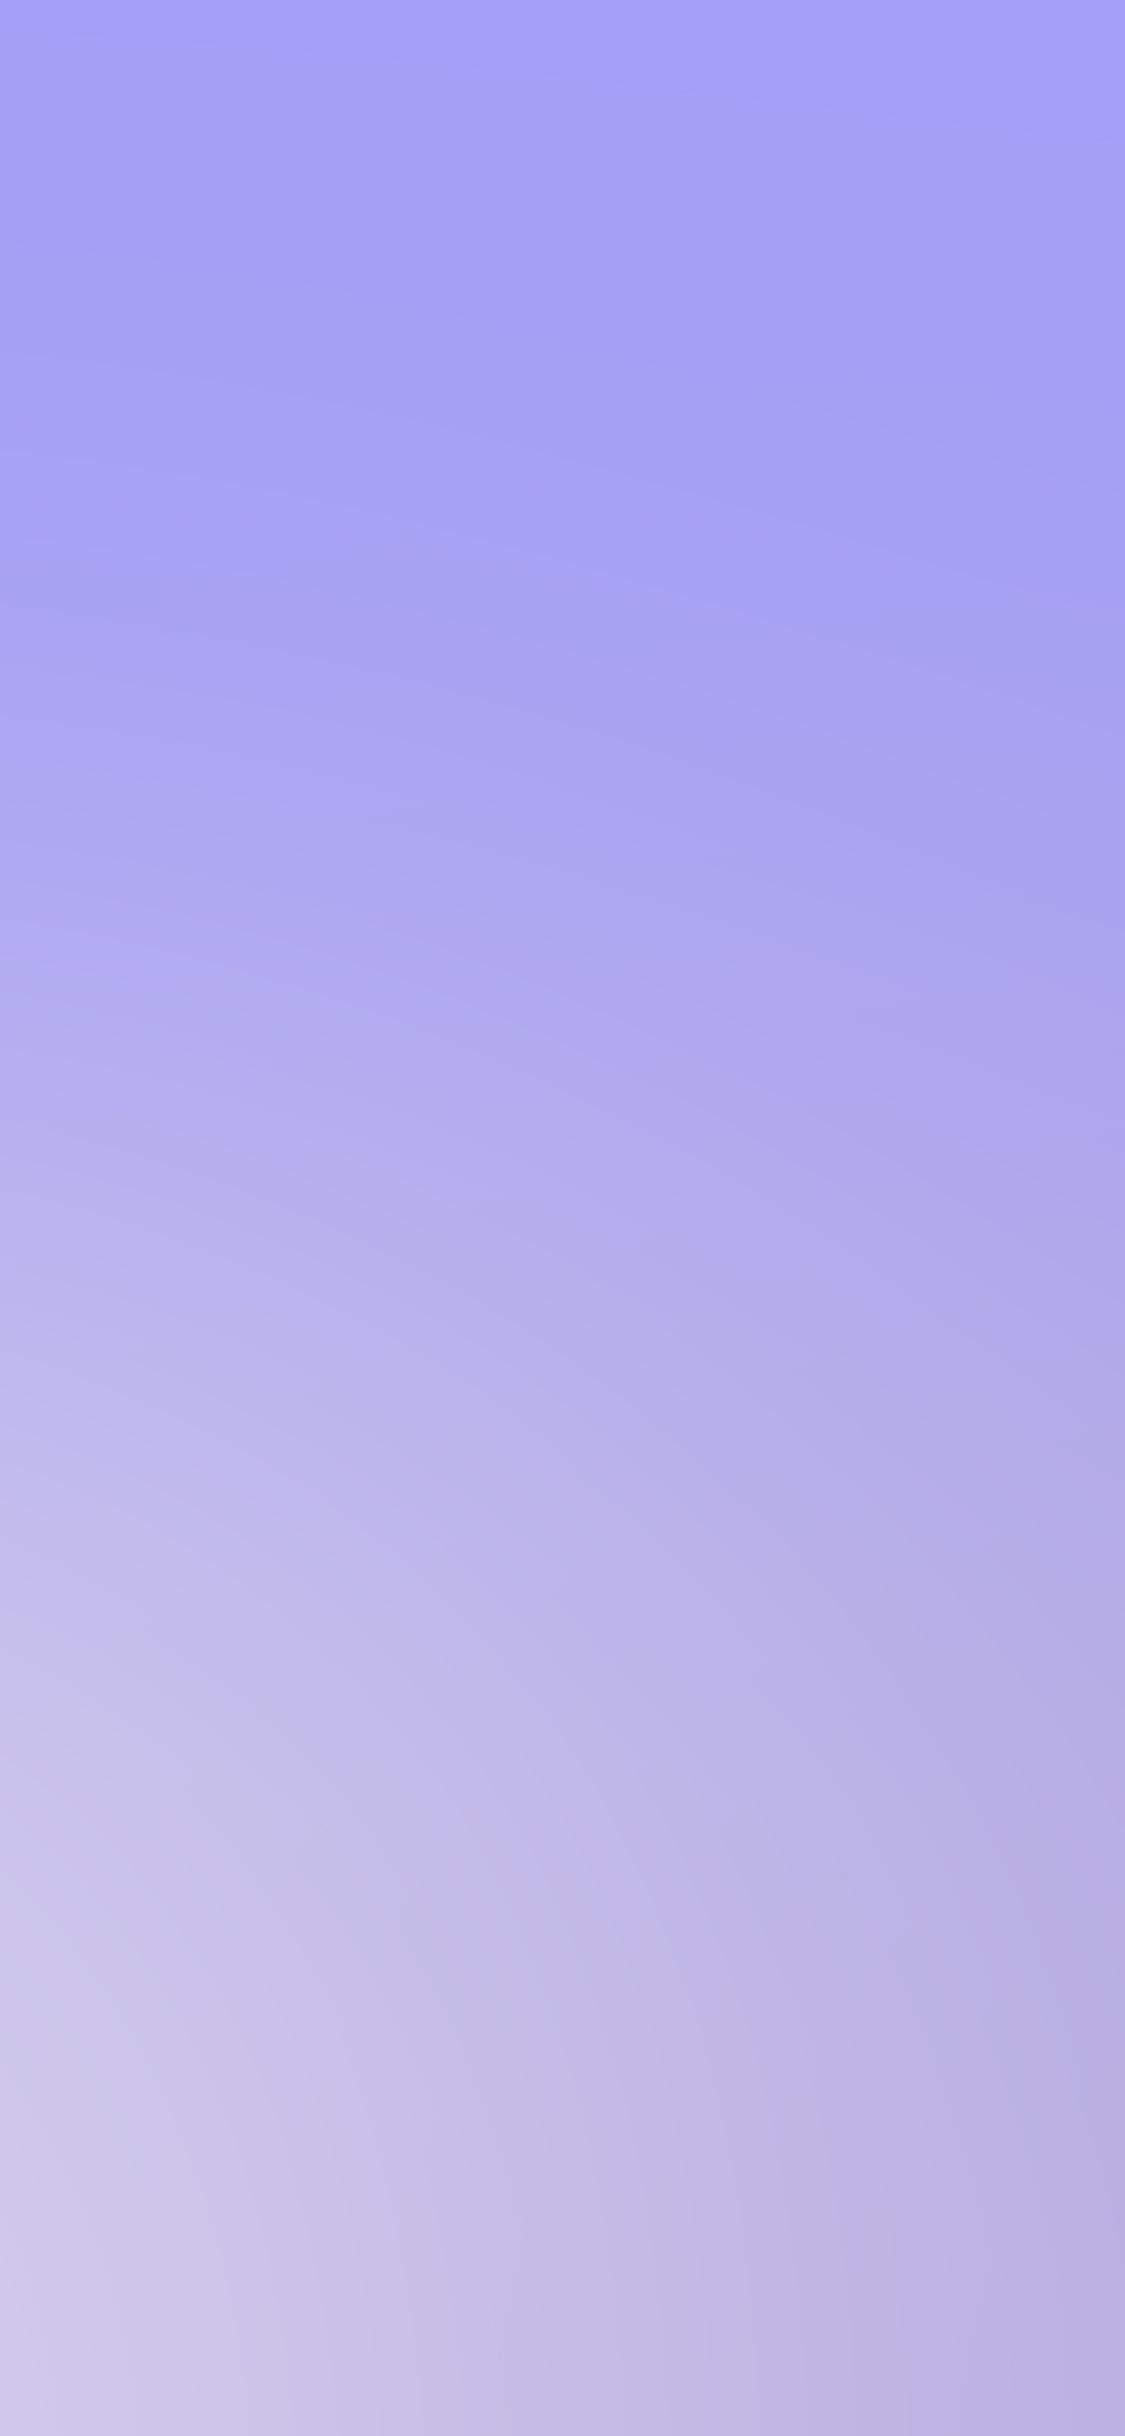 iPhonexpapers.com-Apple-iPhone-wallpaper-so39-blur-gradation-purple-blue